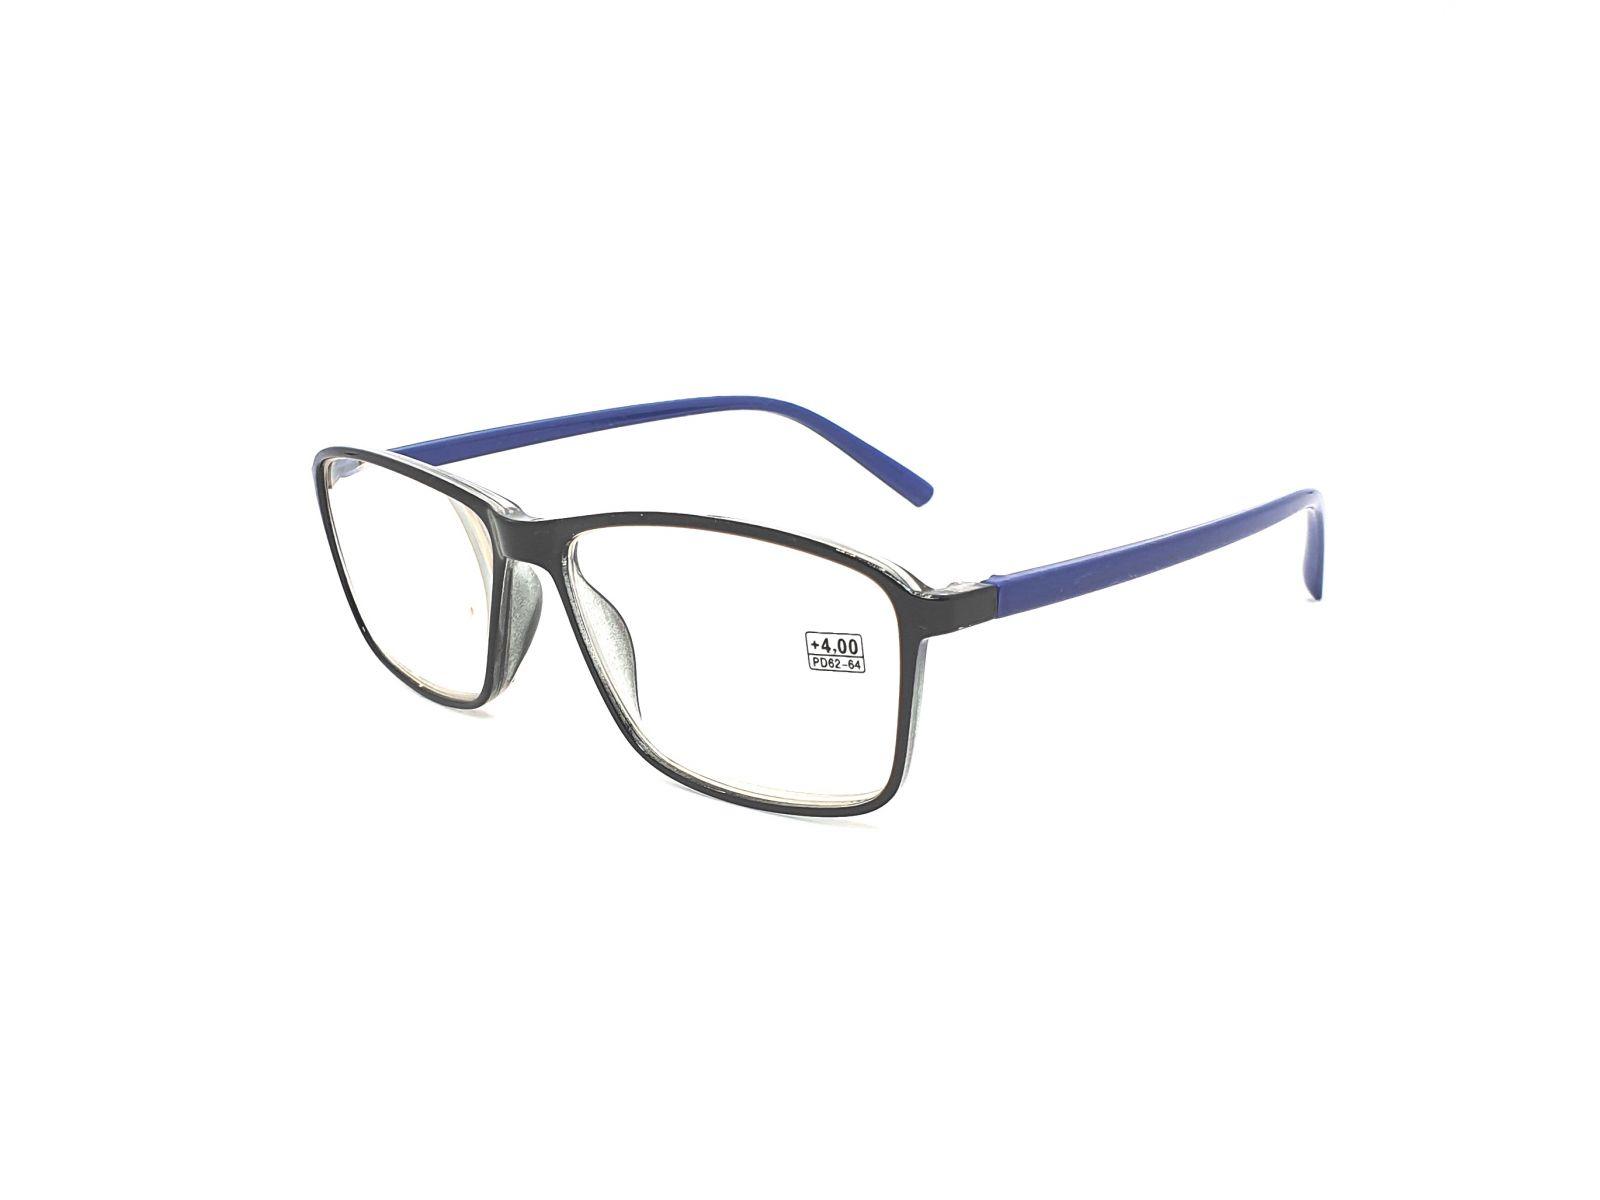 Dioptrické brýle 17218 / +4,00 blue